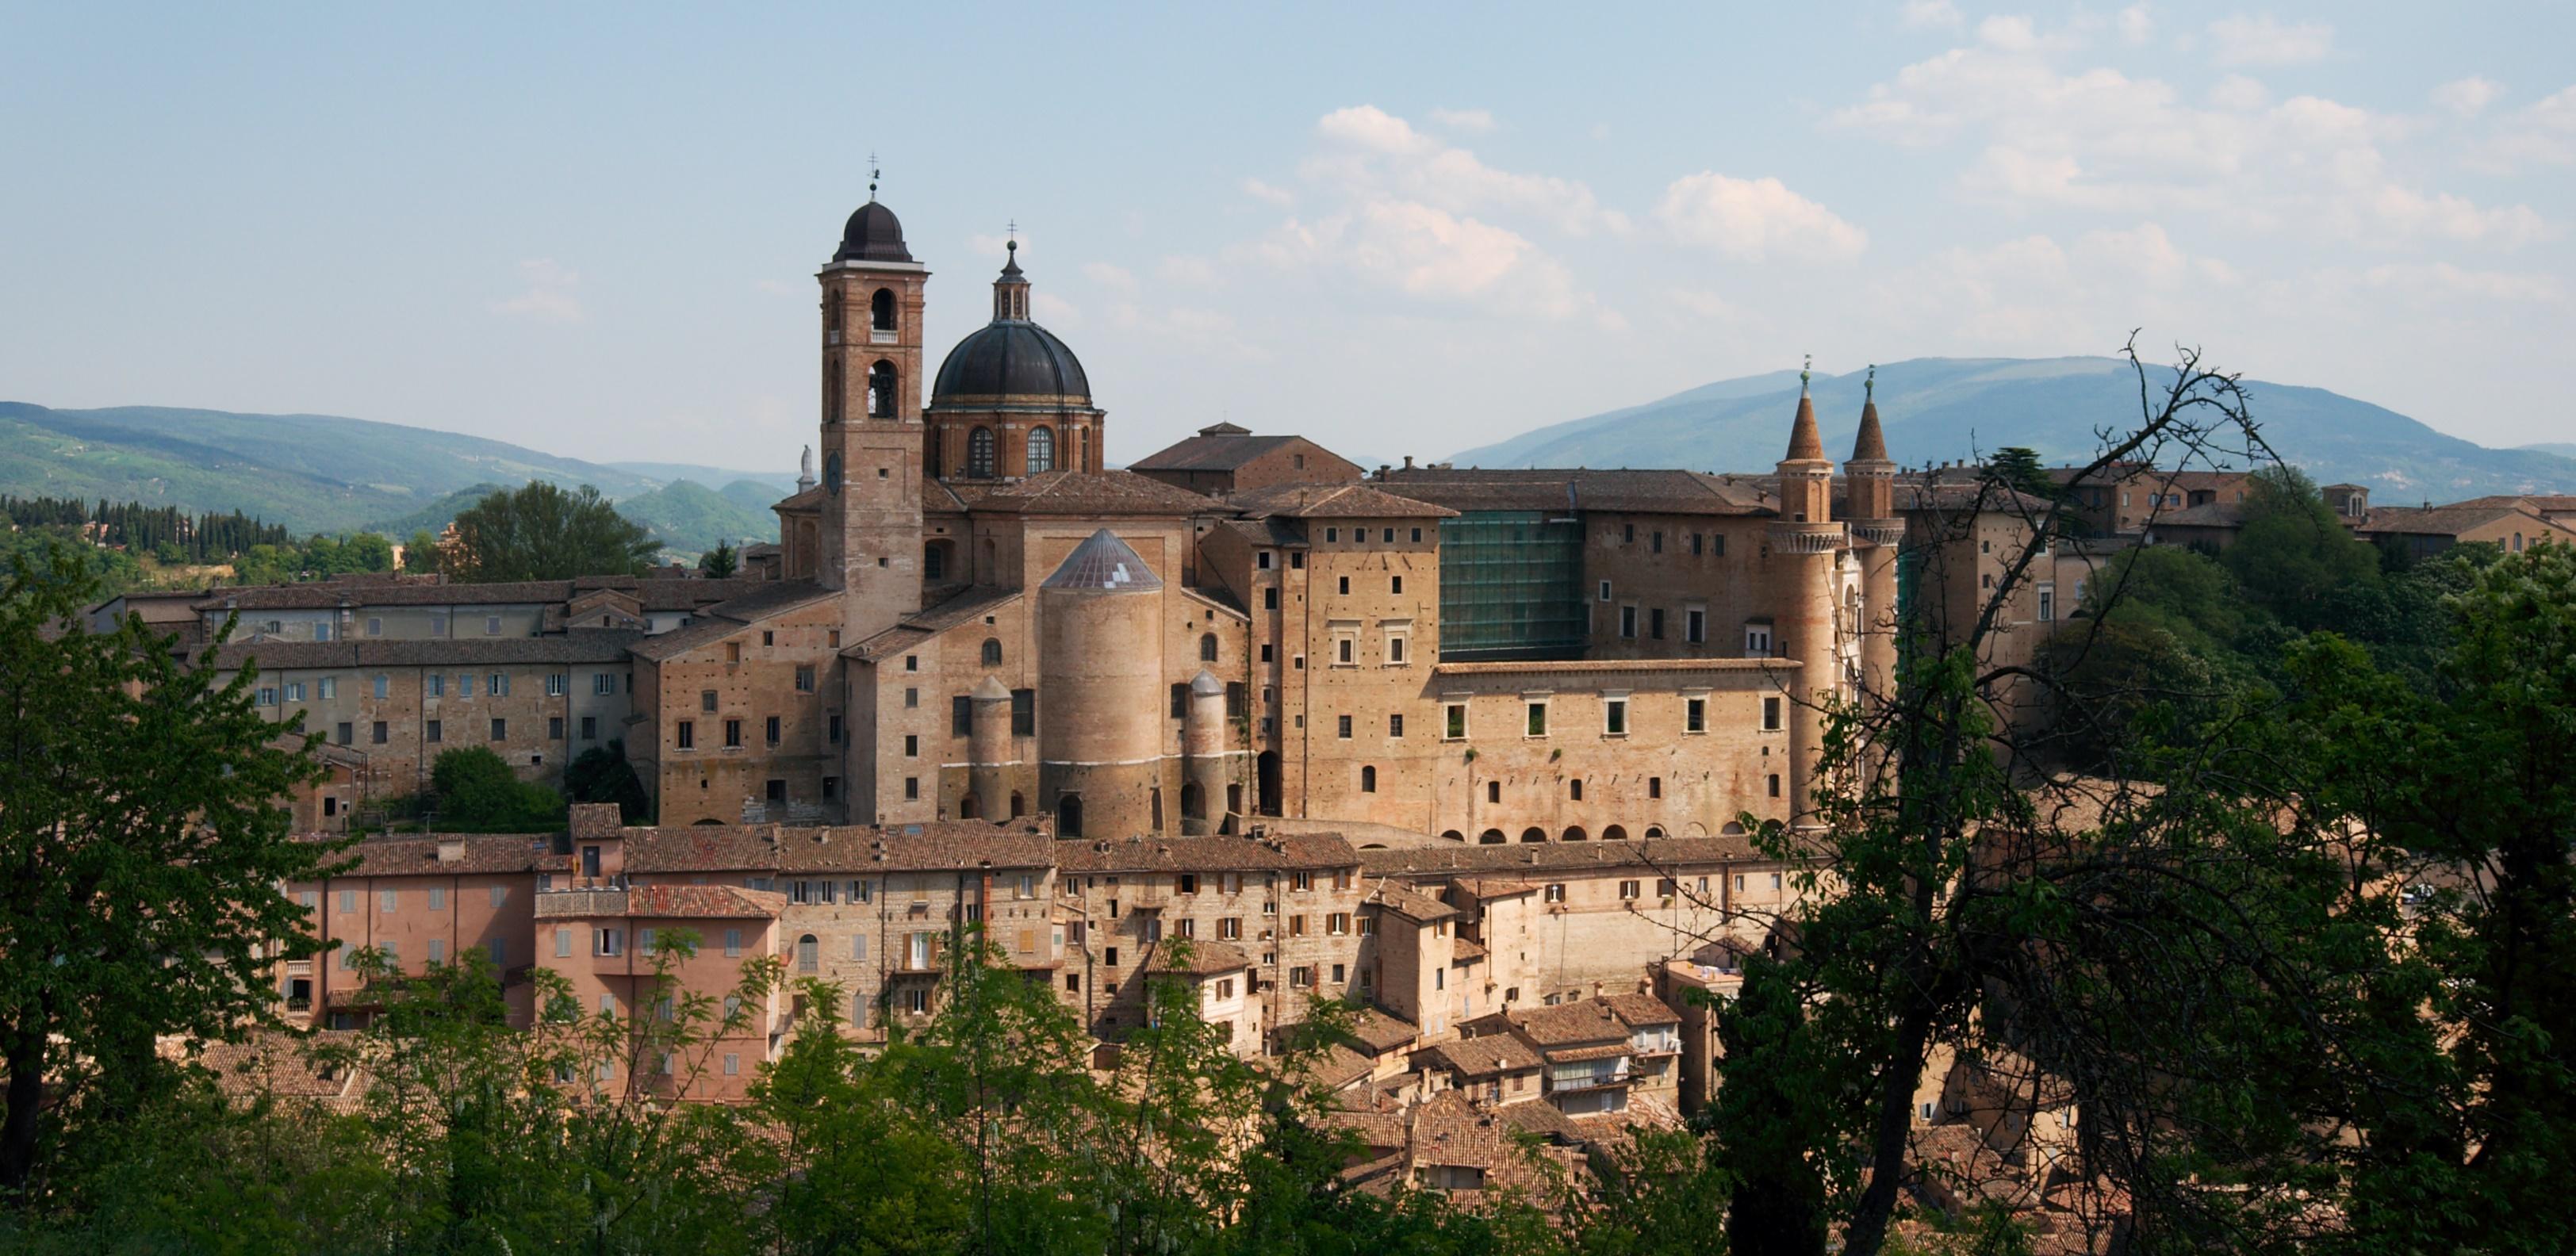 Urbino Wikipedia